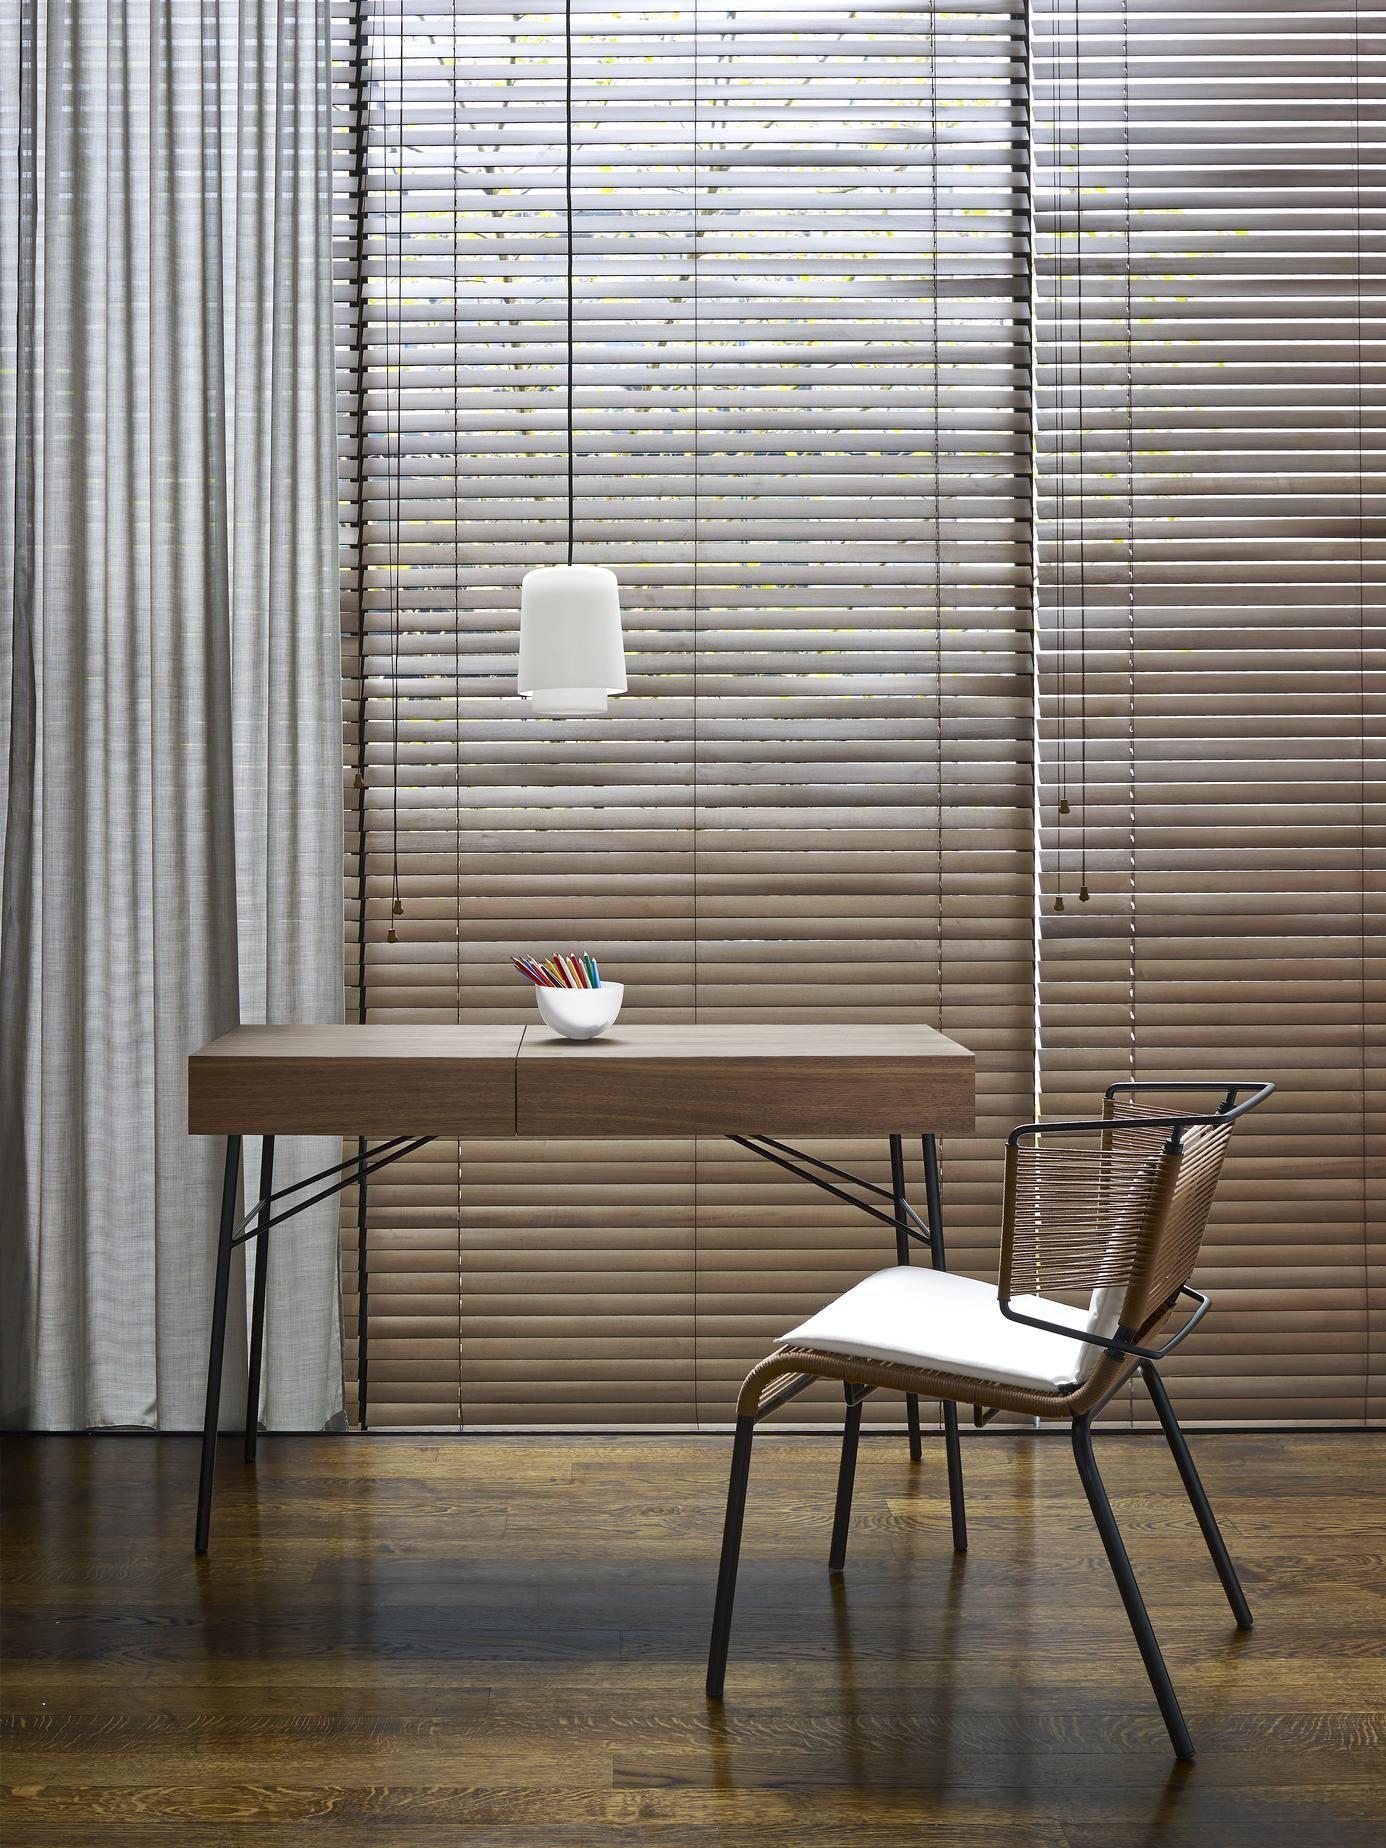 JULIETTE, Entree Designer : Evangelos Vasileiou | Ligne Roset | Design